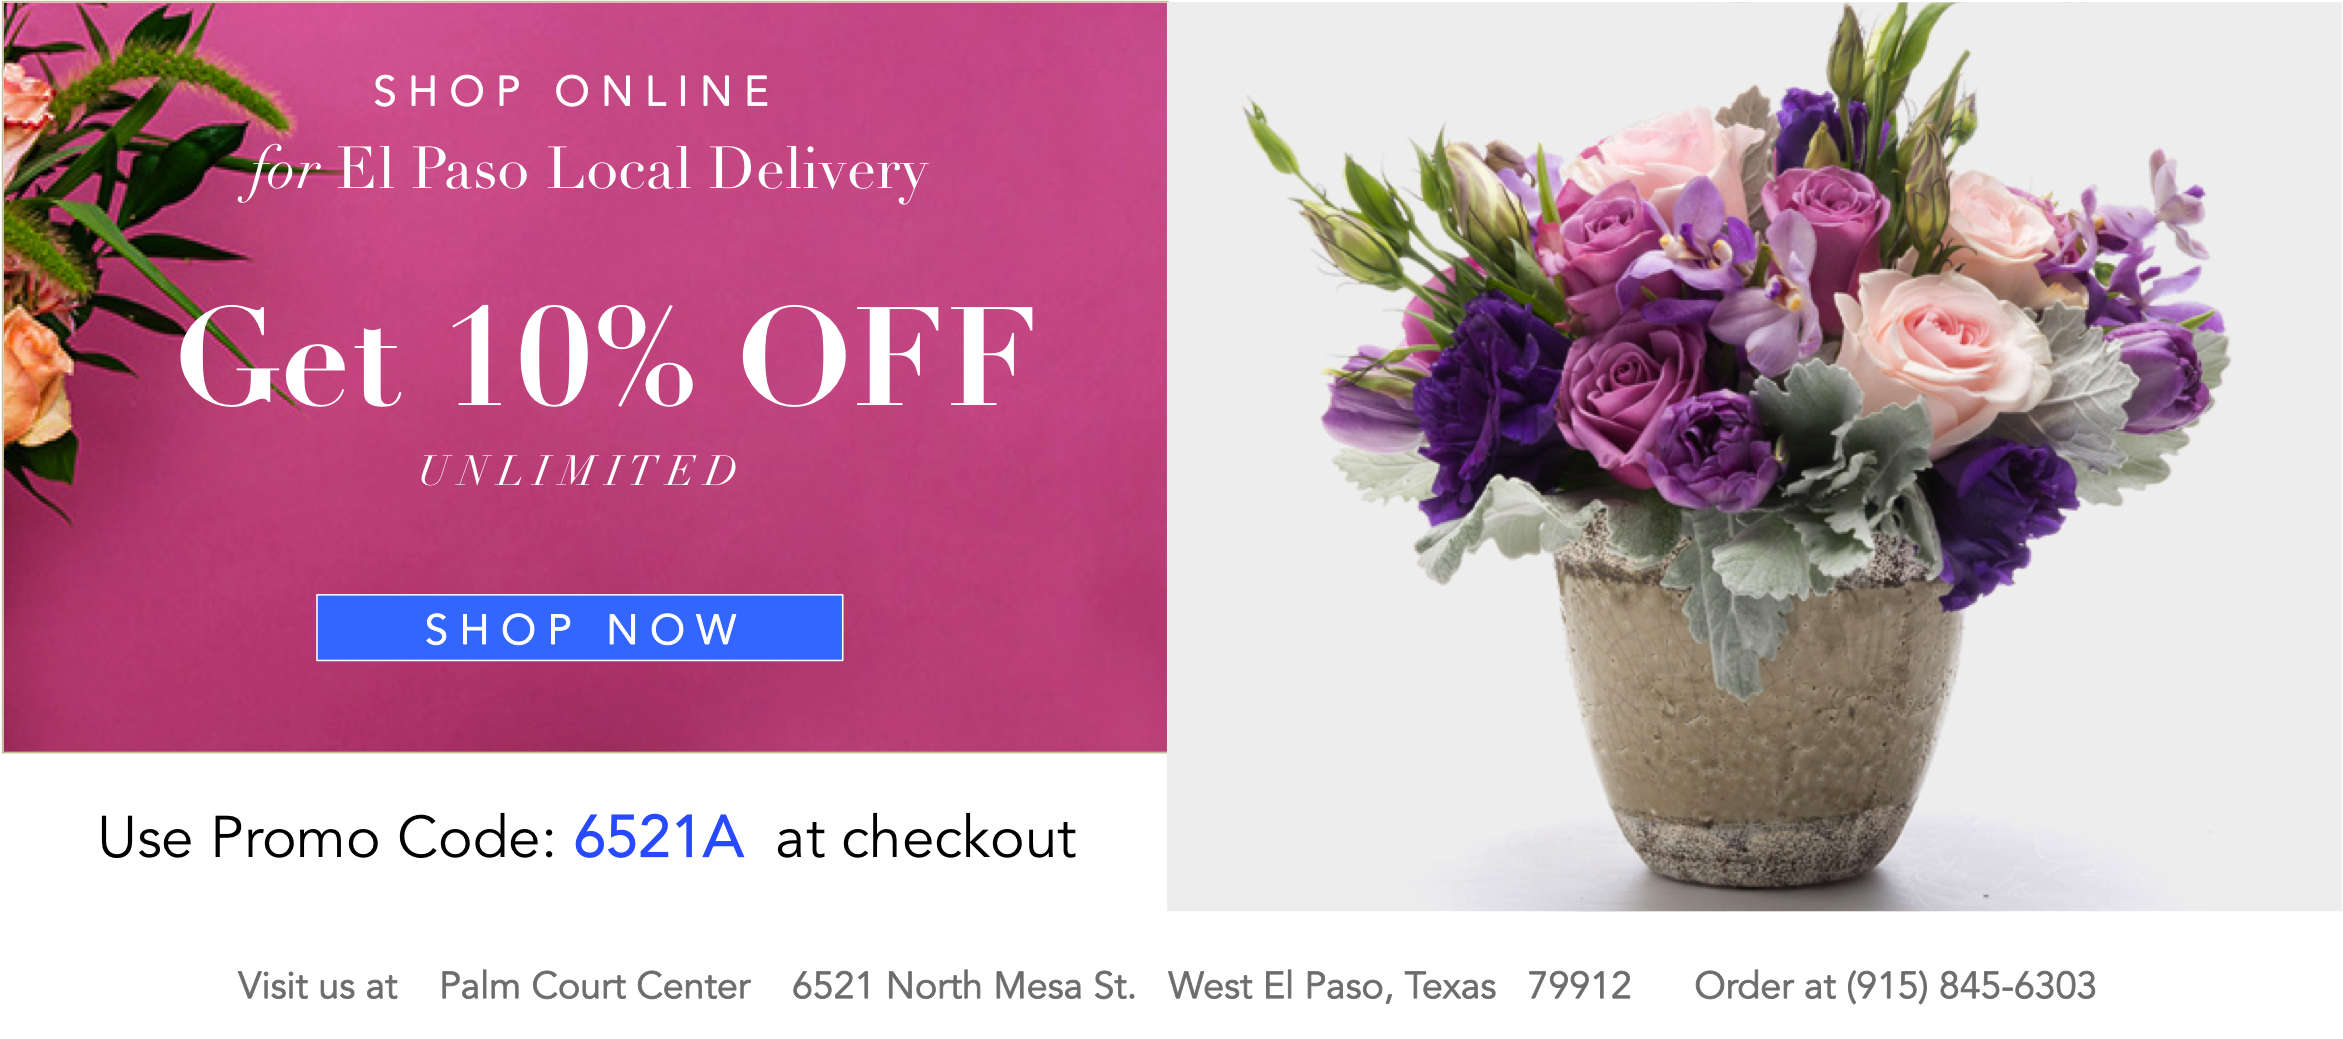 13aangies-floral-designs-el-paso-florist-79912-el-paso-texas-angies-flowers-el-paso-flowershop-el-paso-flowerdelivery-elegant-flowers-79912-westside-weddings-events-rentals-bodas-flores.png